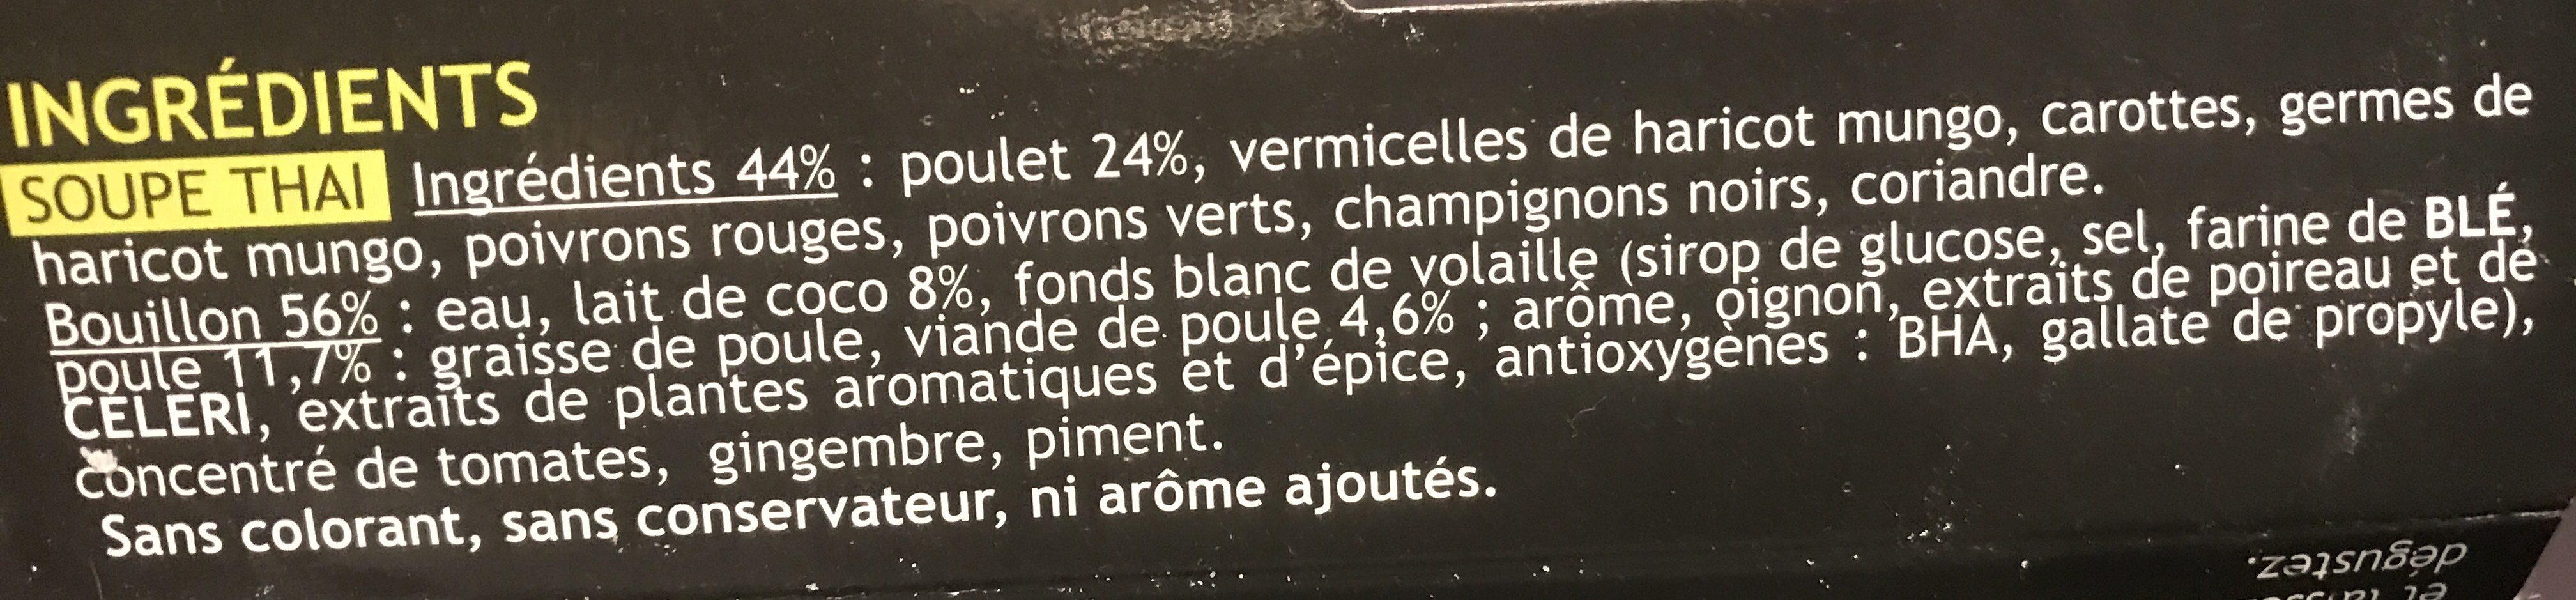 Soupe Thaïlandaise, 2 Fois 250 Grammes, Marque Madern - Ingrédients - fr